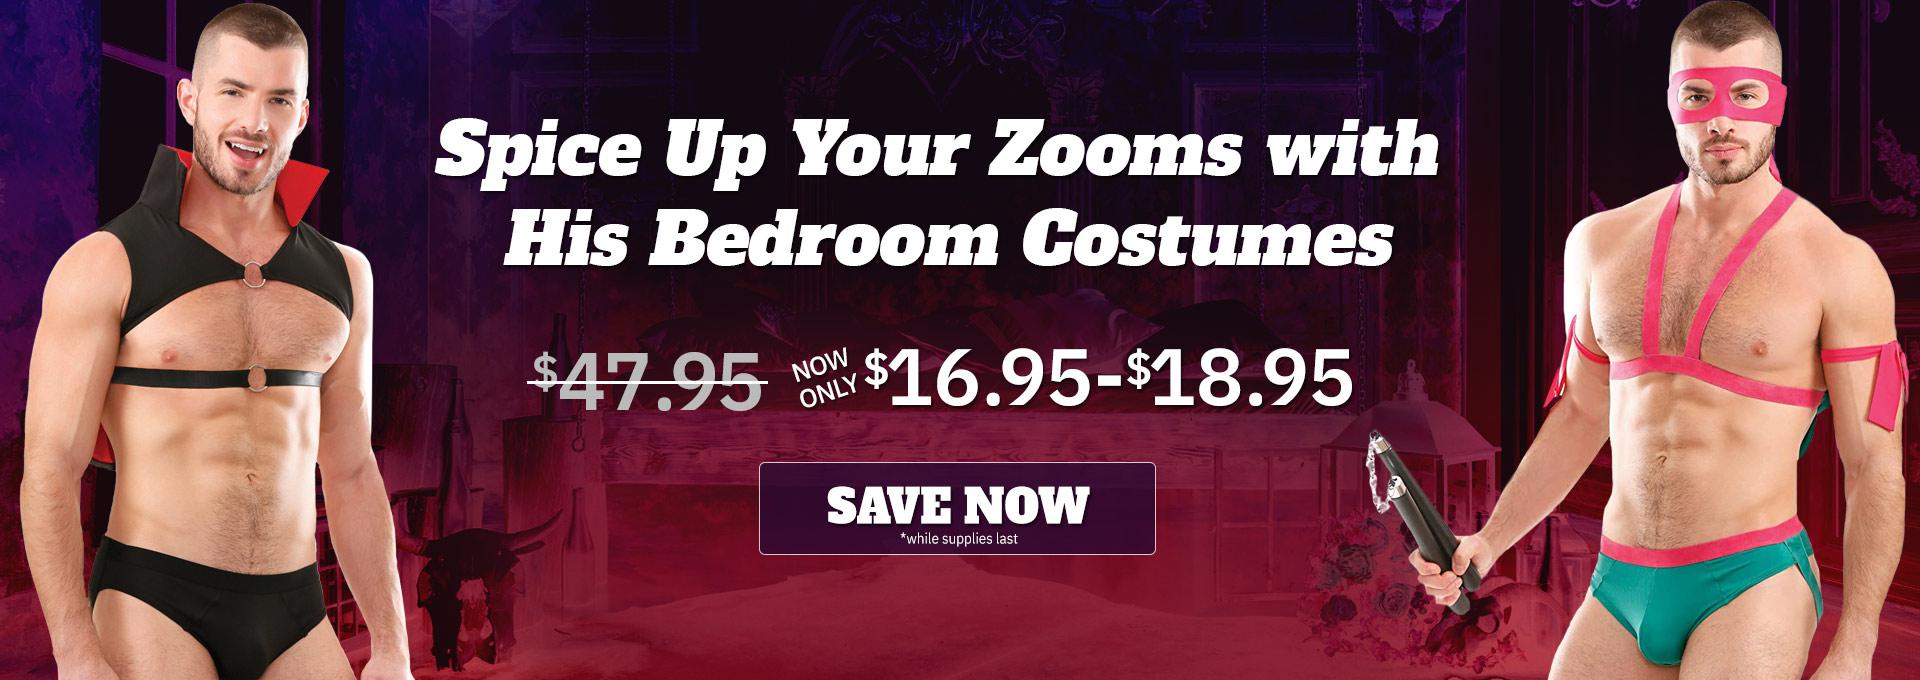 Bedroom Costumes for Men on Sale